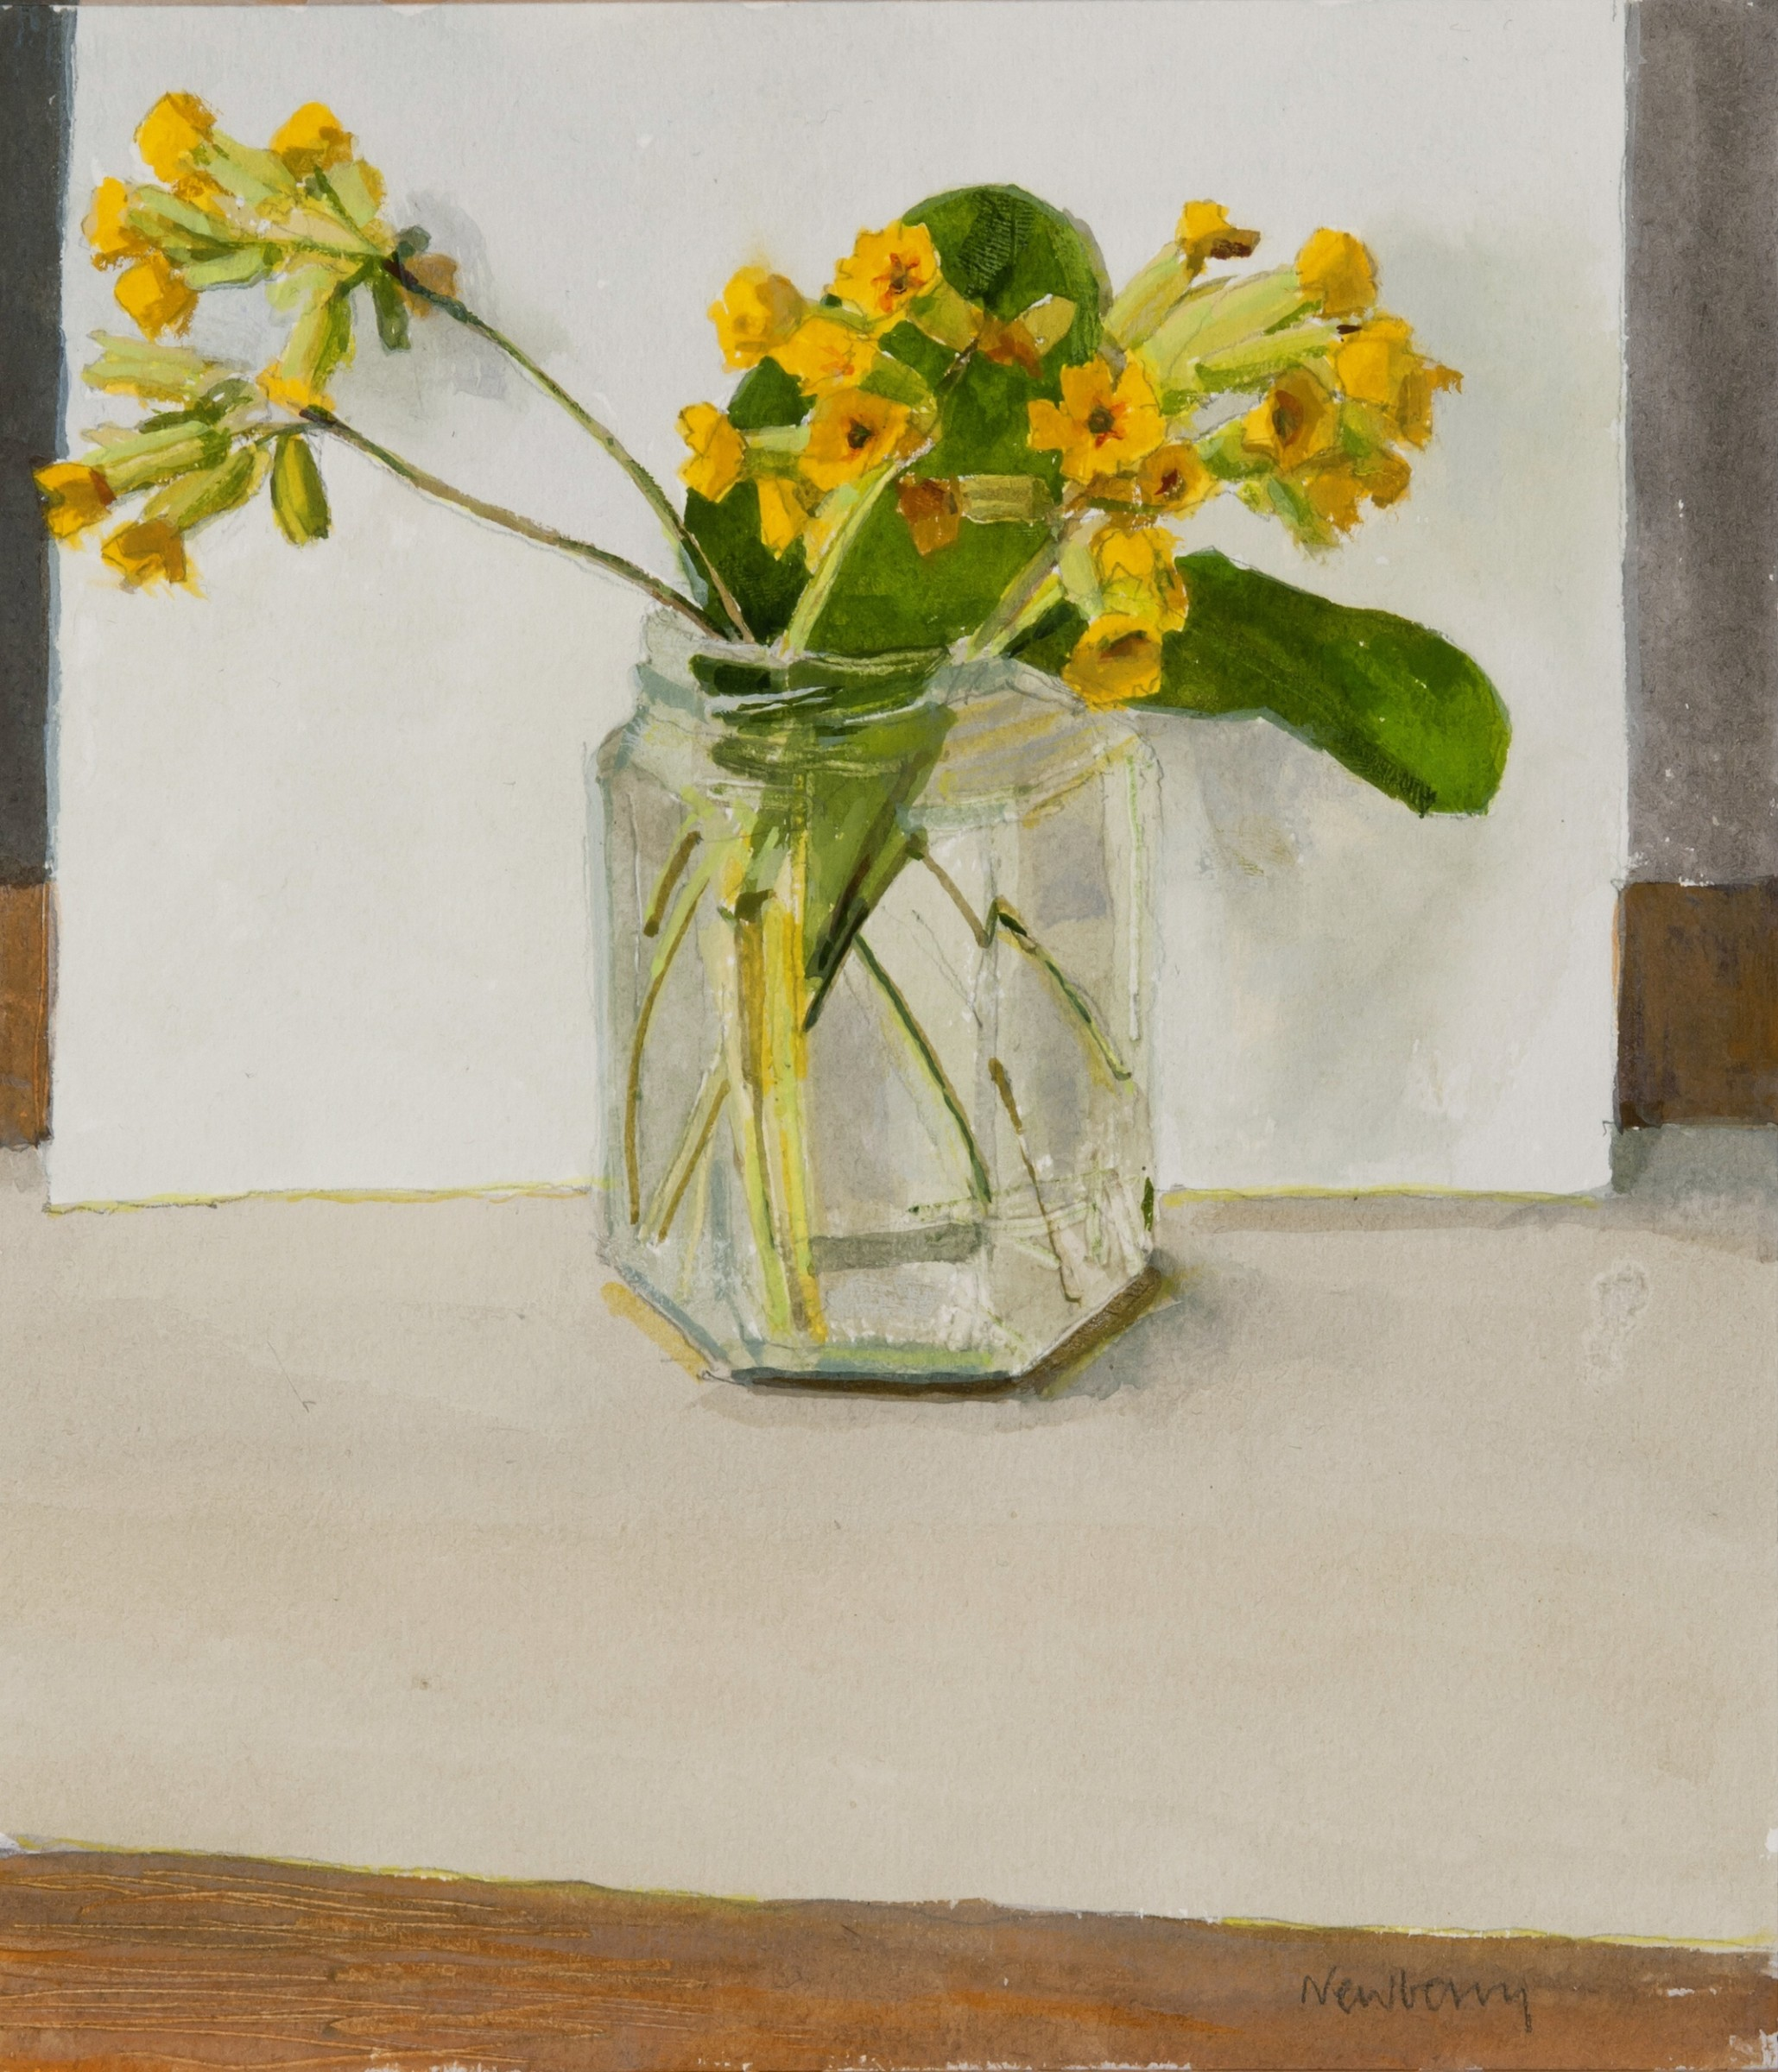 <span class=&#34;link fancybox-details-link&#34;><a href=&#34;/exhibitions/24/works/artworks_standalone10758/&#34;>View Detail Page</a></span><div class=&#34;artist&#34;><span class=&#34;artist&#34;><strong>John Newberry</strong></span></div><div class=&#34;title&#34;><em>Cowslips</em></div><div class=&#34;medium&#34;>watercolour</div><div class=&#34;dimensions&#34;>47x41cm</div>